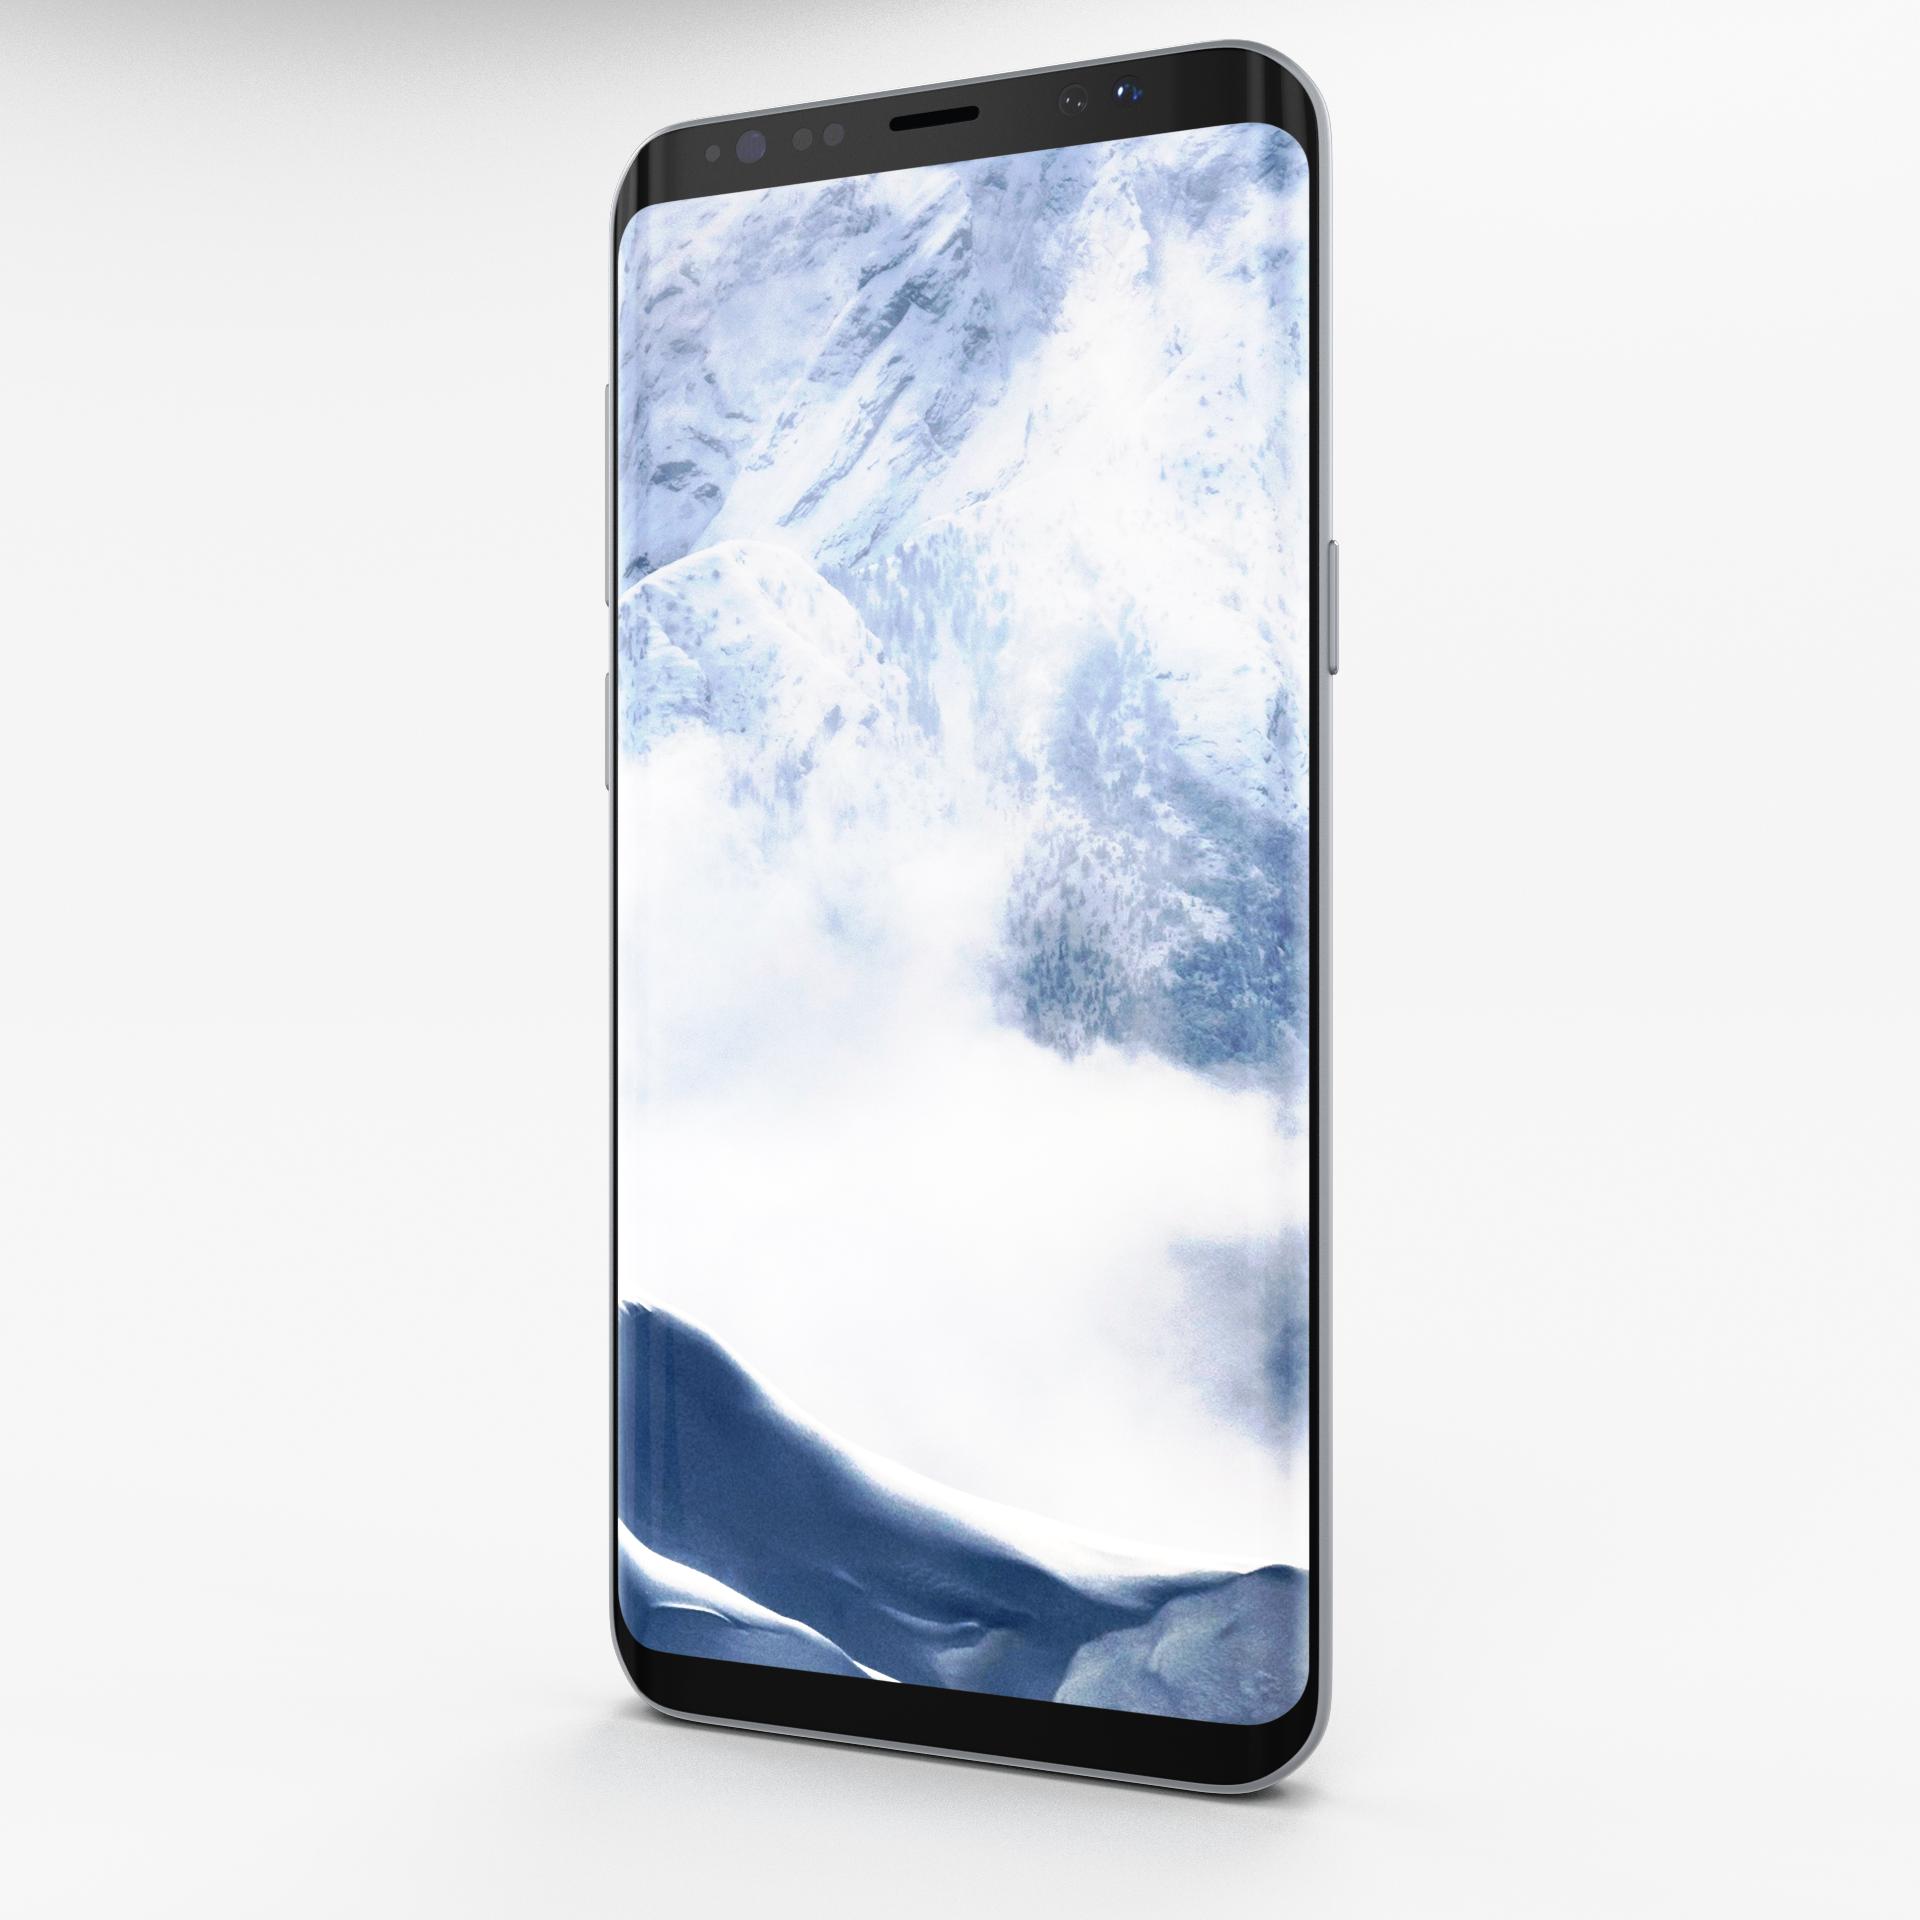 Samsung Galaxy S8 Plus Original 4g Lte Mobile Phone Octa Core 6 2 12 0mp Salesphonesep Com Samsung Galaxy Samsung 4g Lte